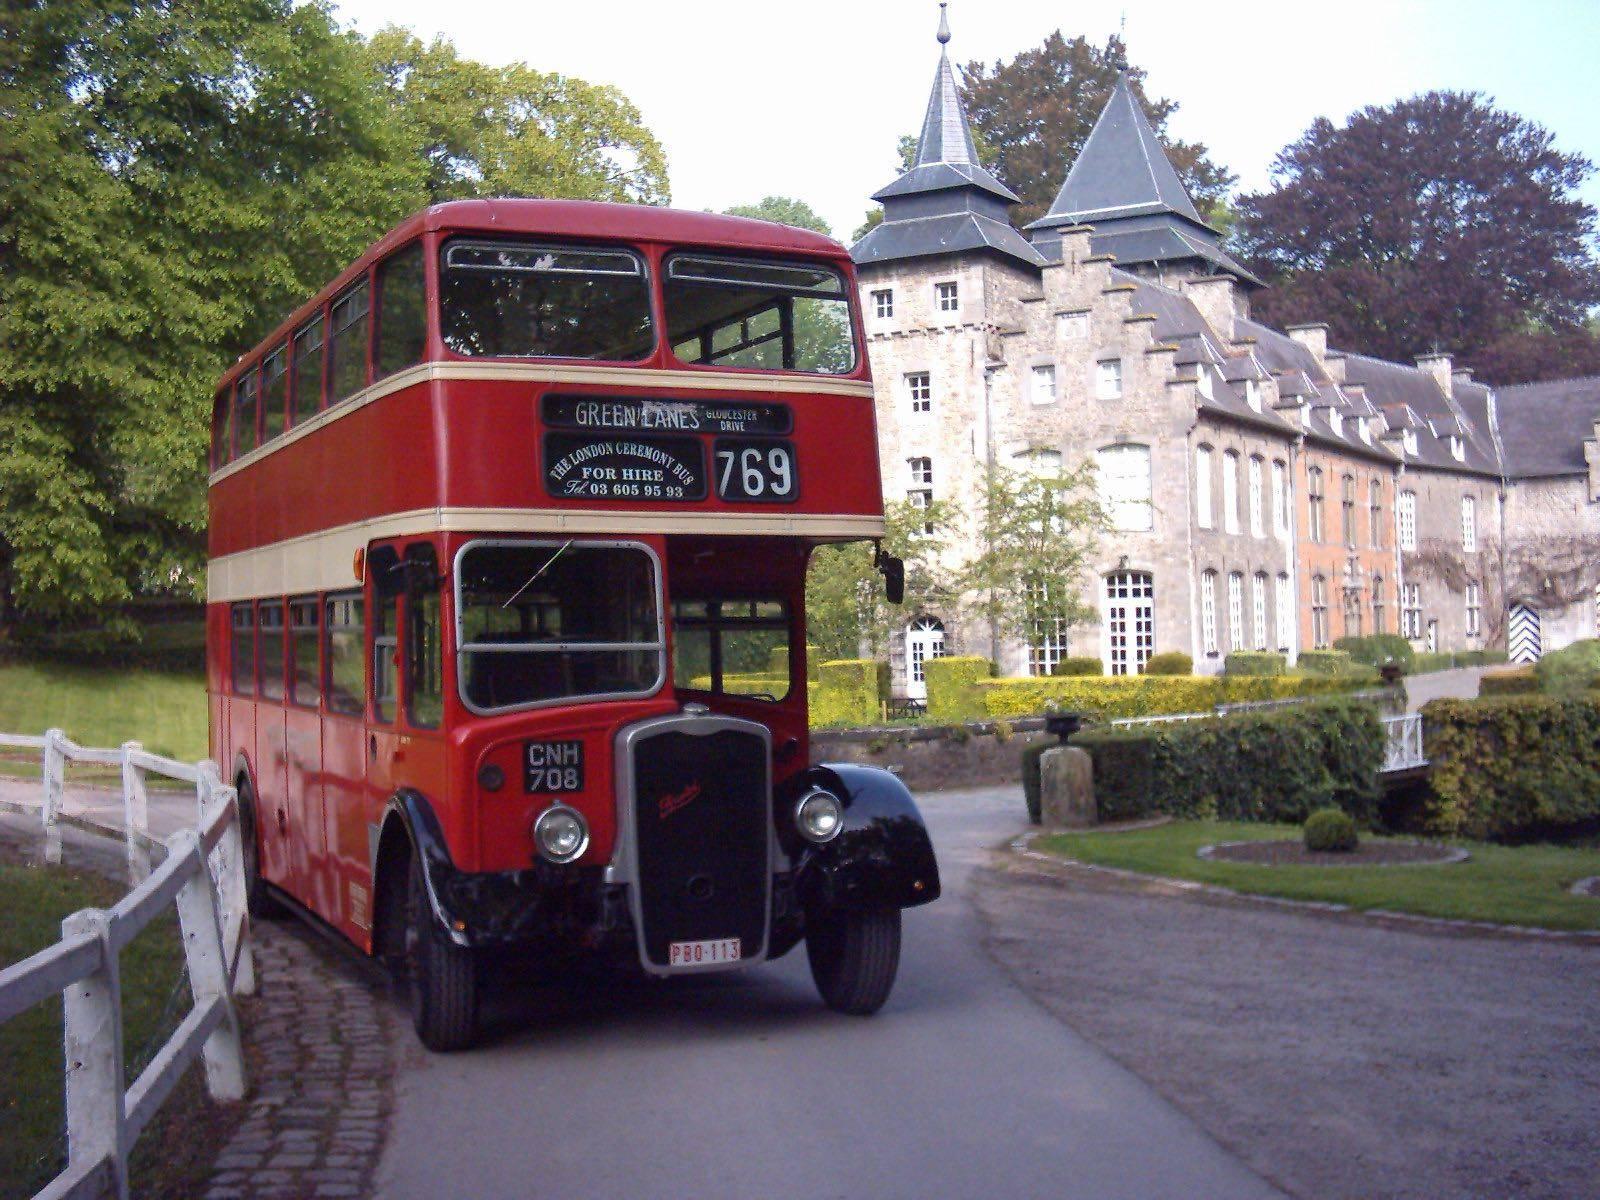 The London Ceremony Bus - Trouwvervoer - Ceremonievervoer - Bus - House of Weddings - 19